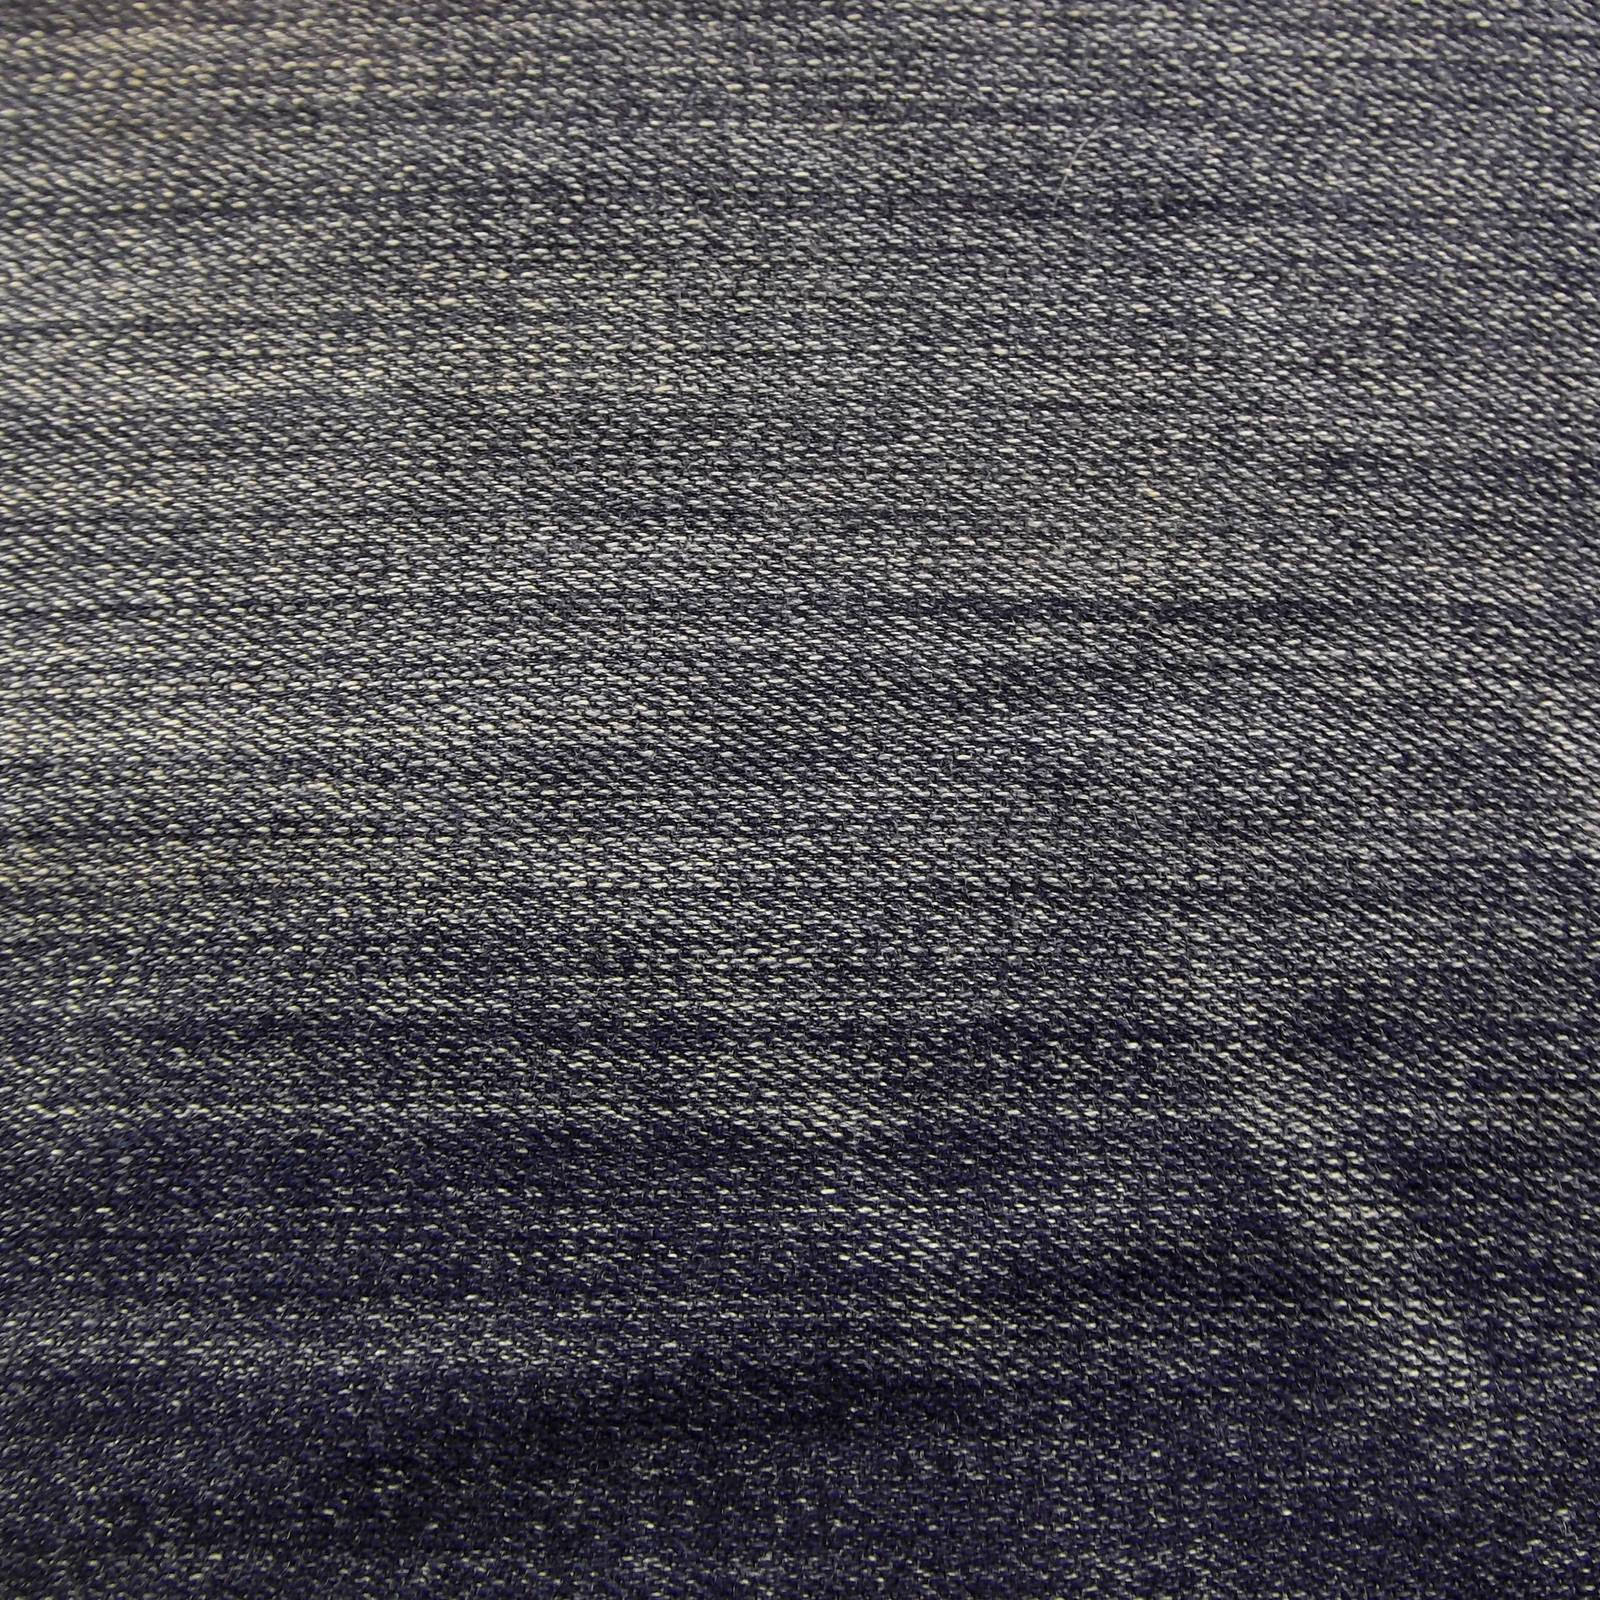 Blue Denim by alytre